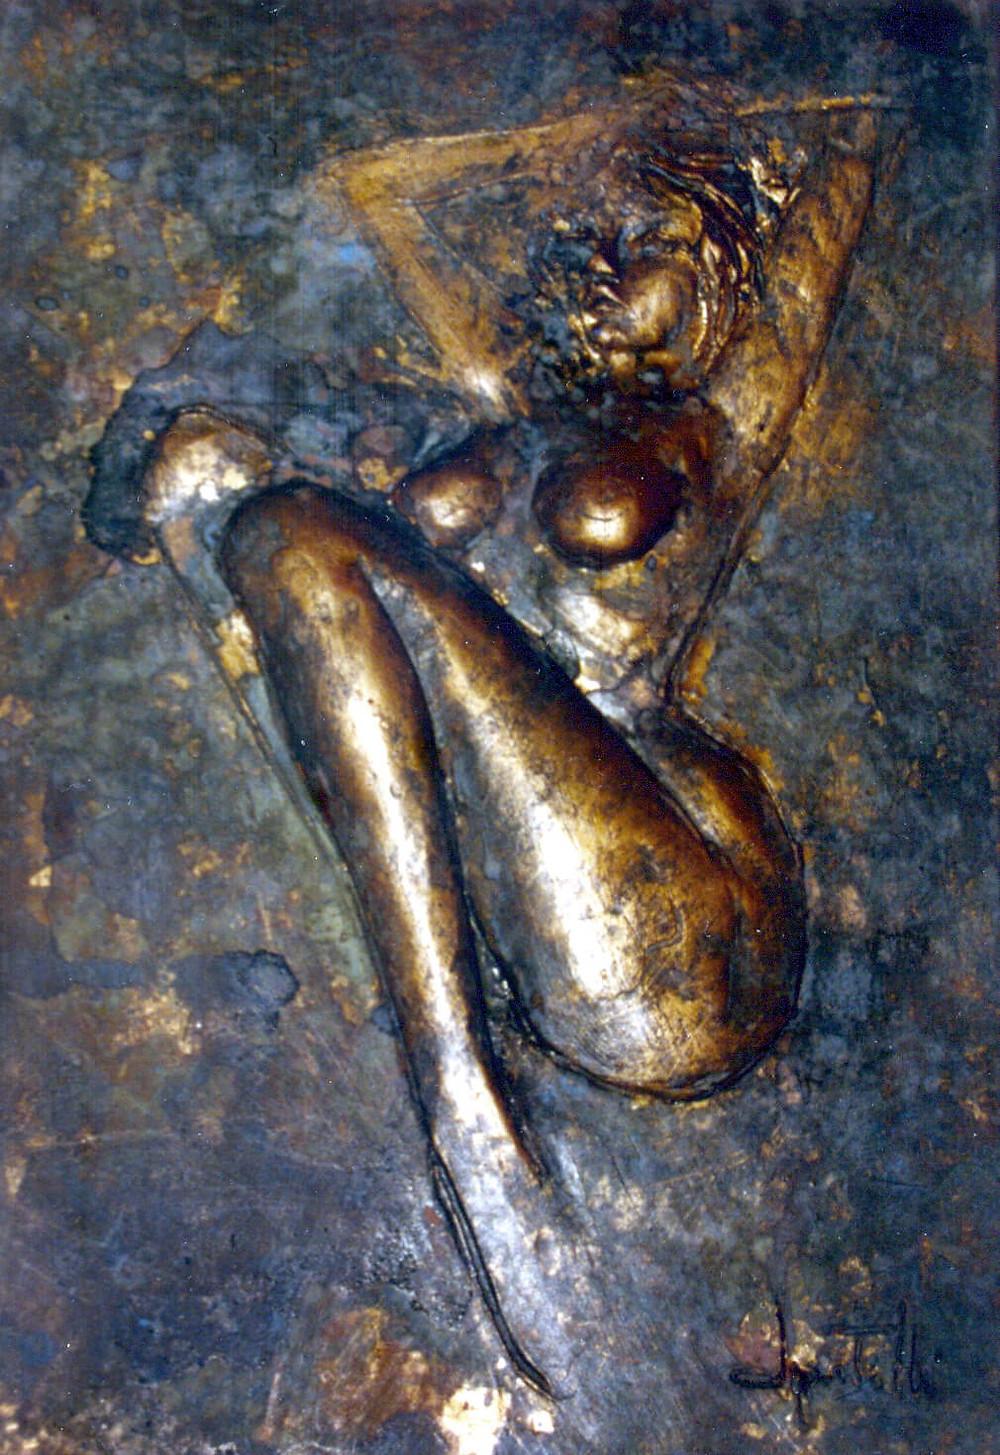 Bassorilievo argilla patina bronzo, nudo femminile